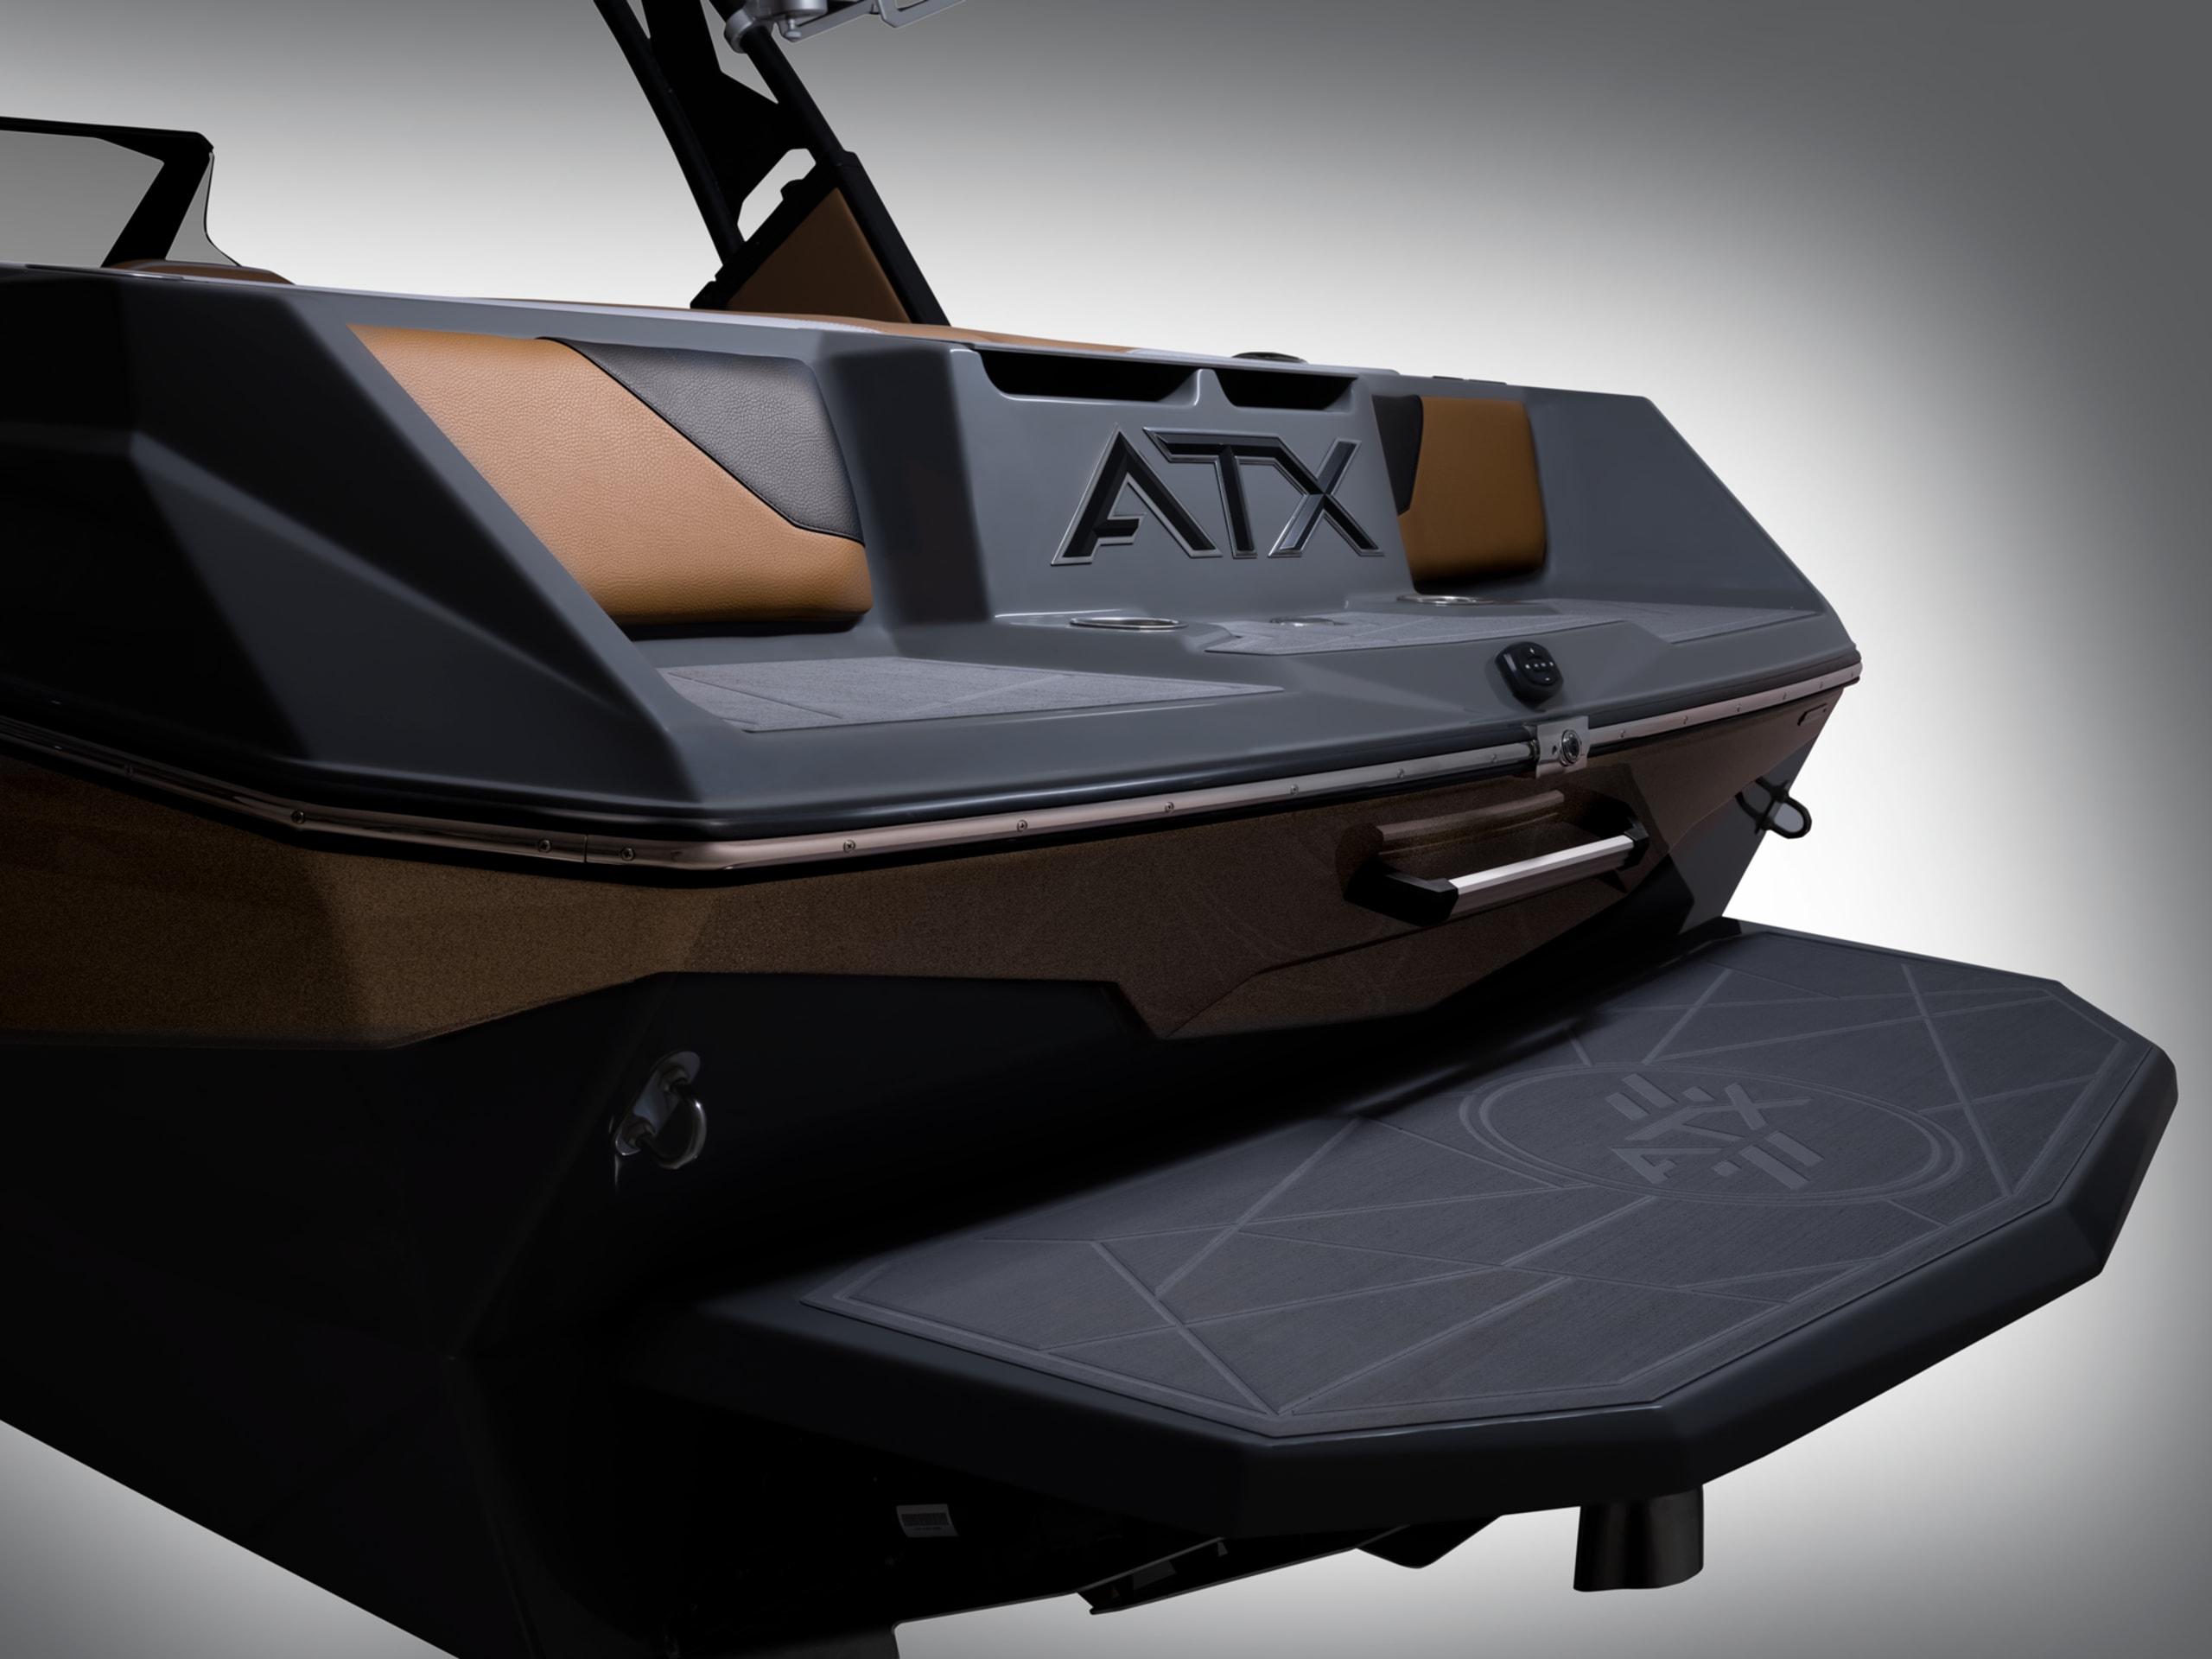 2021 ATX 22 Type S ATX Surf Boats Bradlee Rutledge 0042 v2